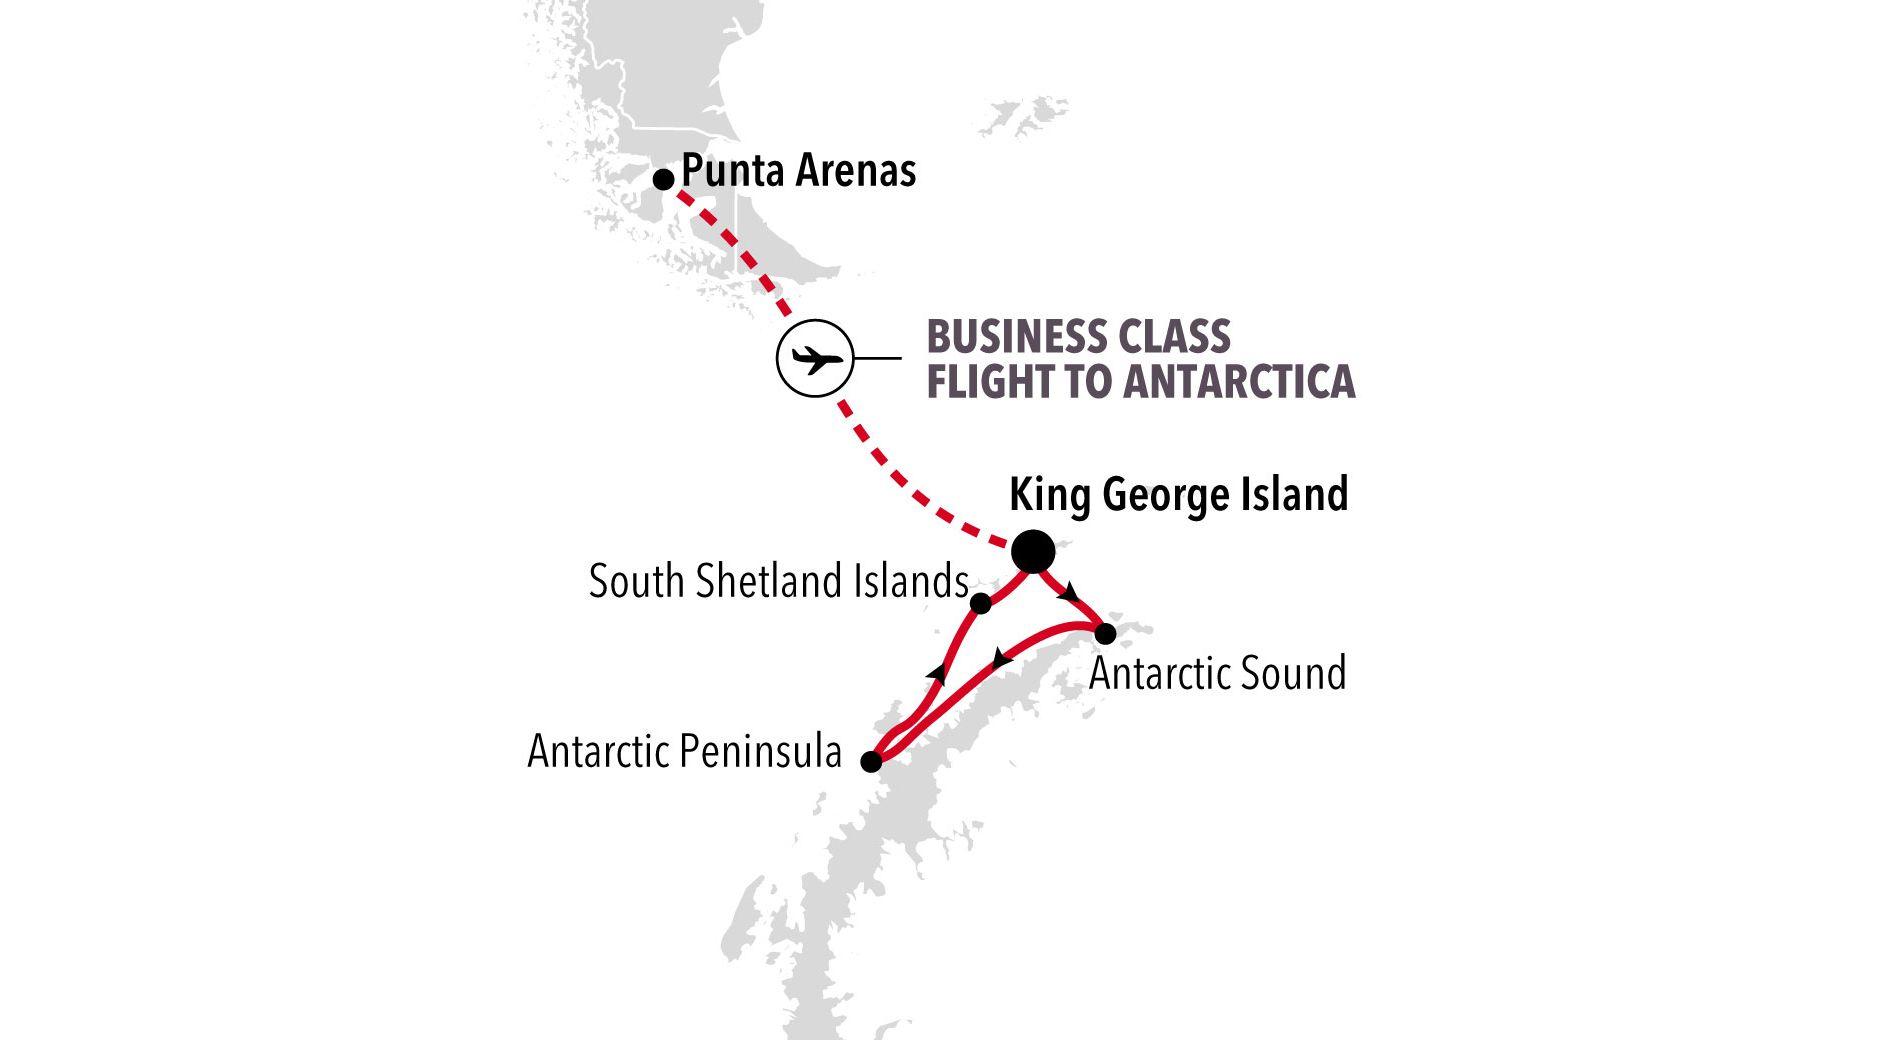 E1211217006 - King George Island to King George Island